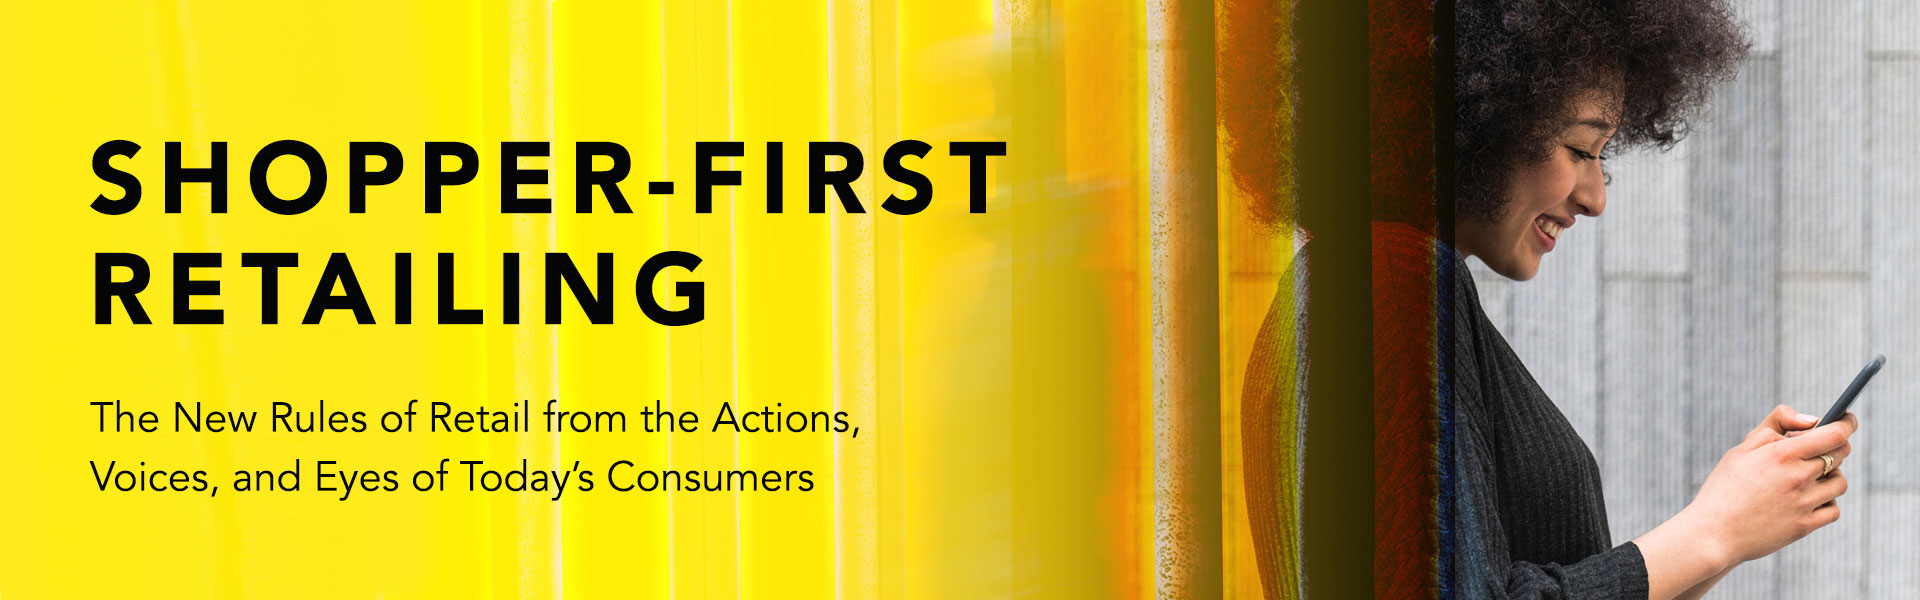 Shopper-First Retailing